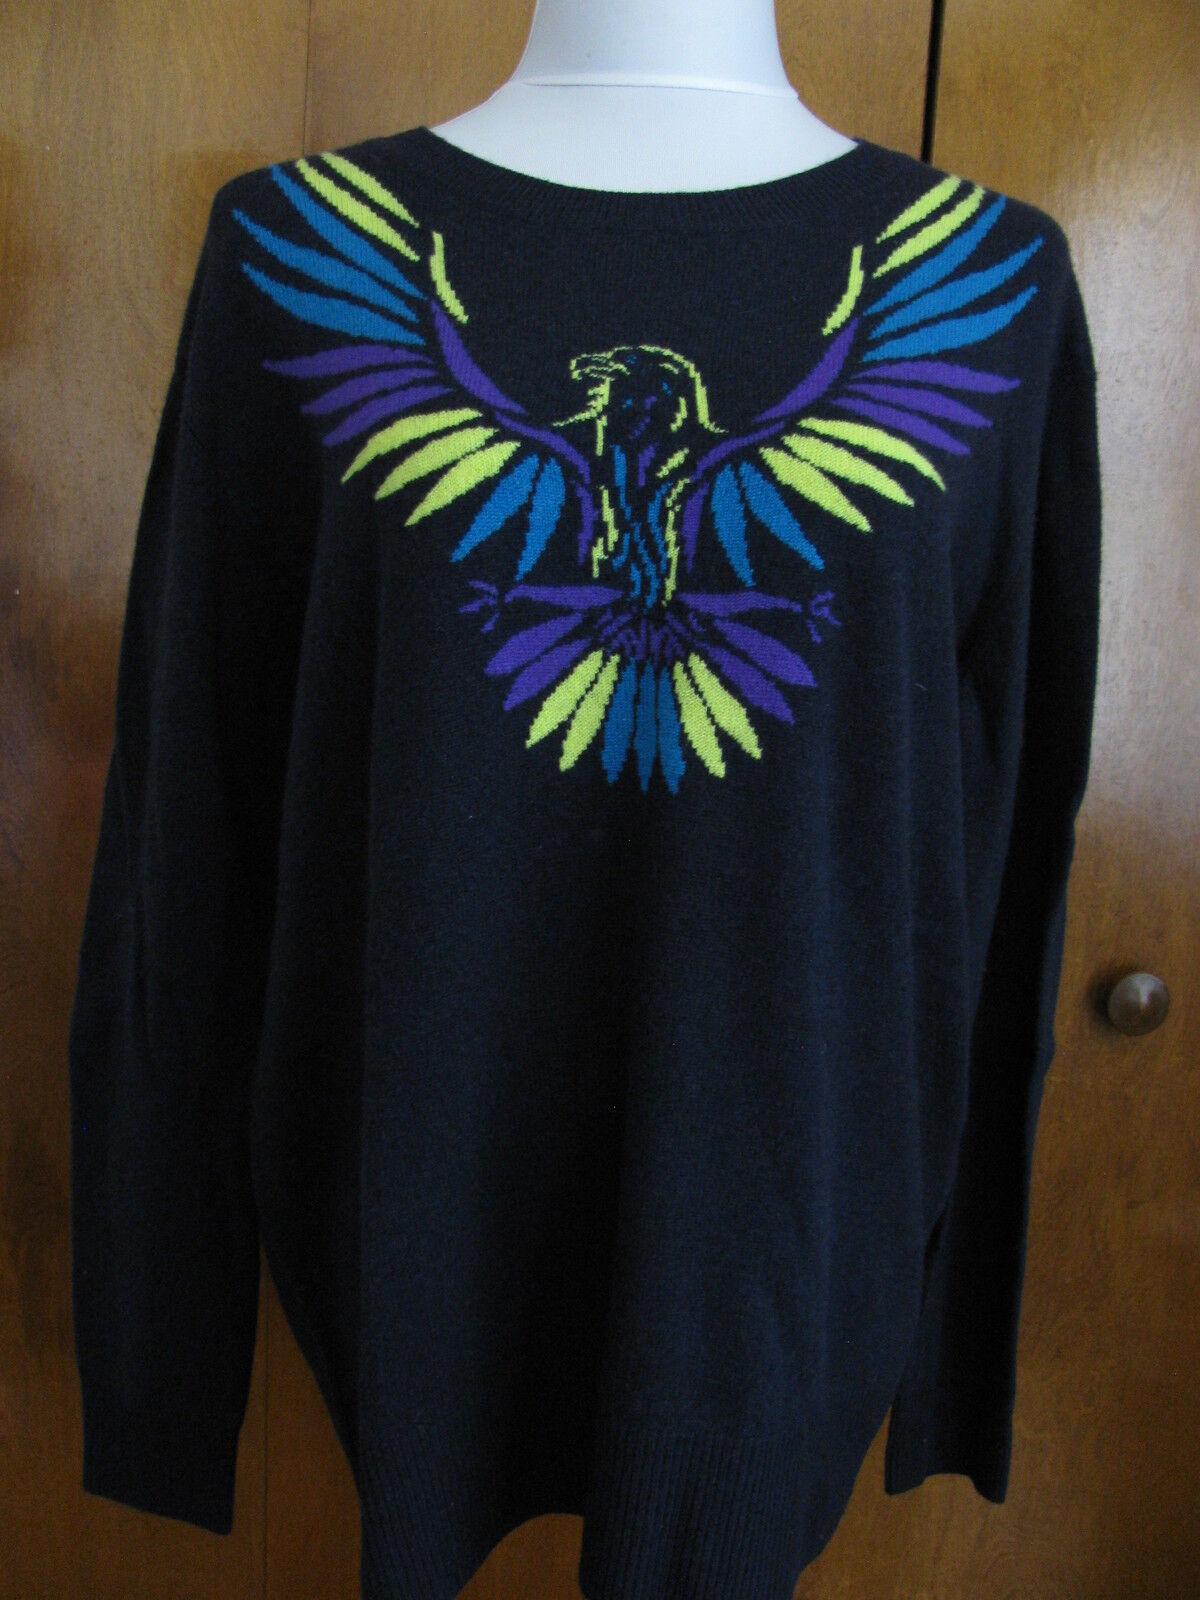 Aqua women's Navy Combo Cashmere Sweater Size S M NWT